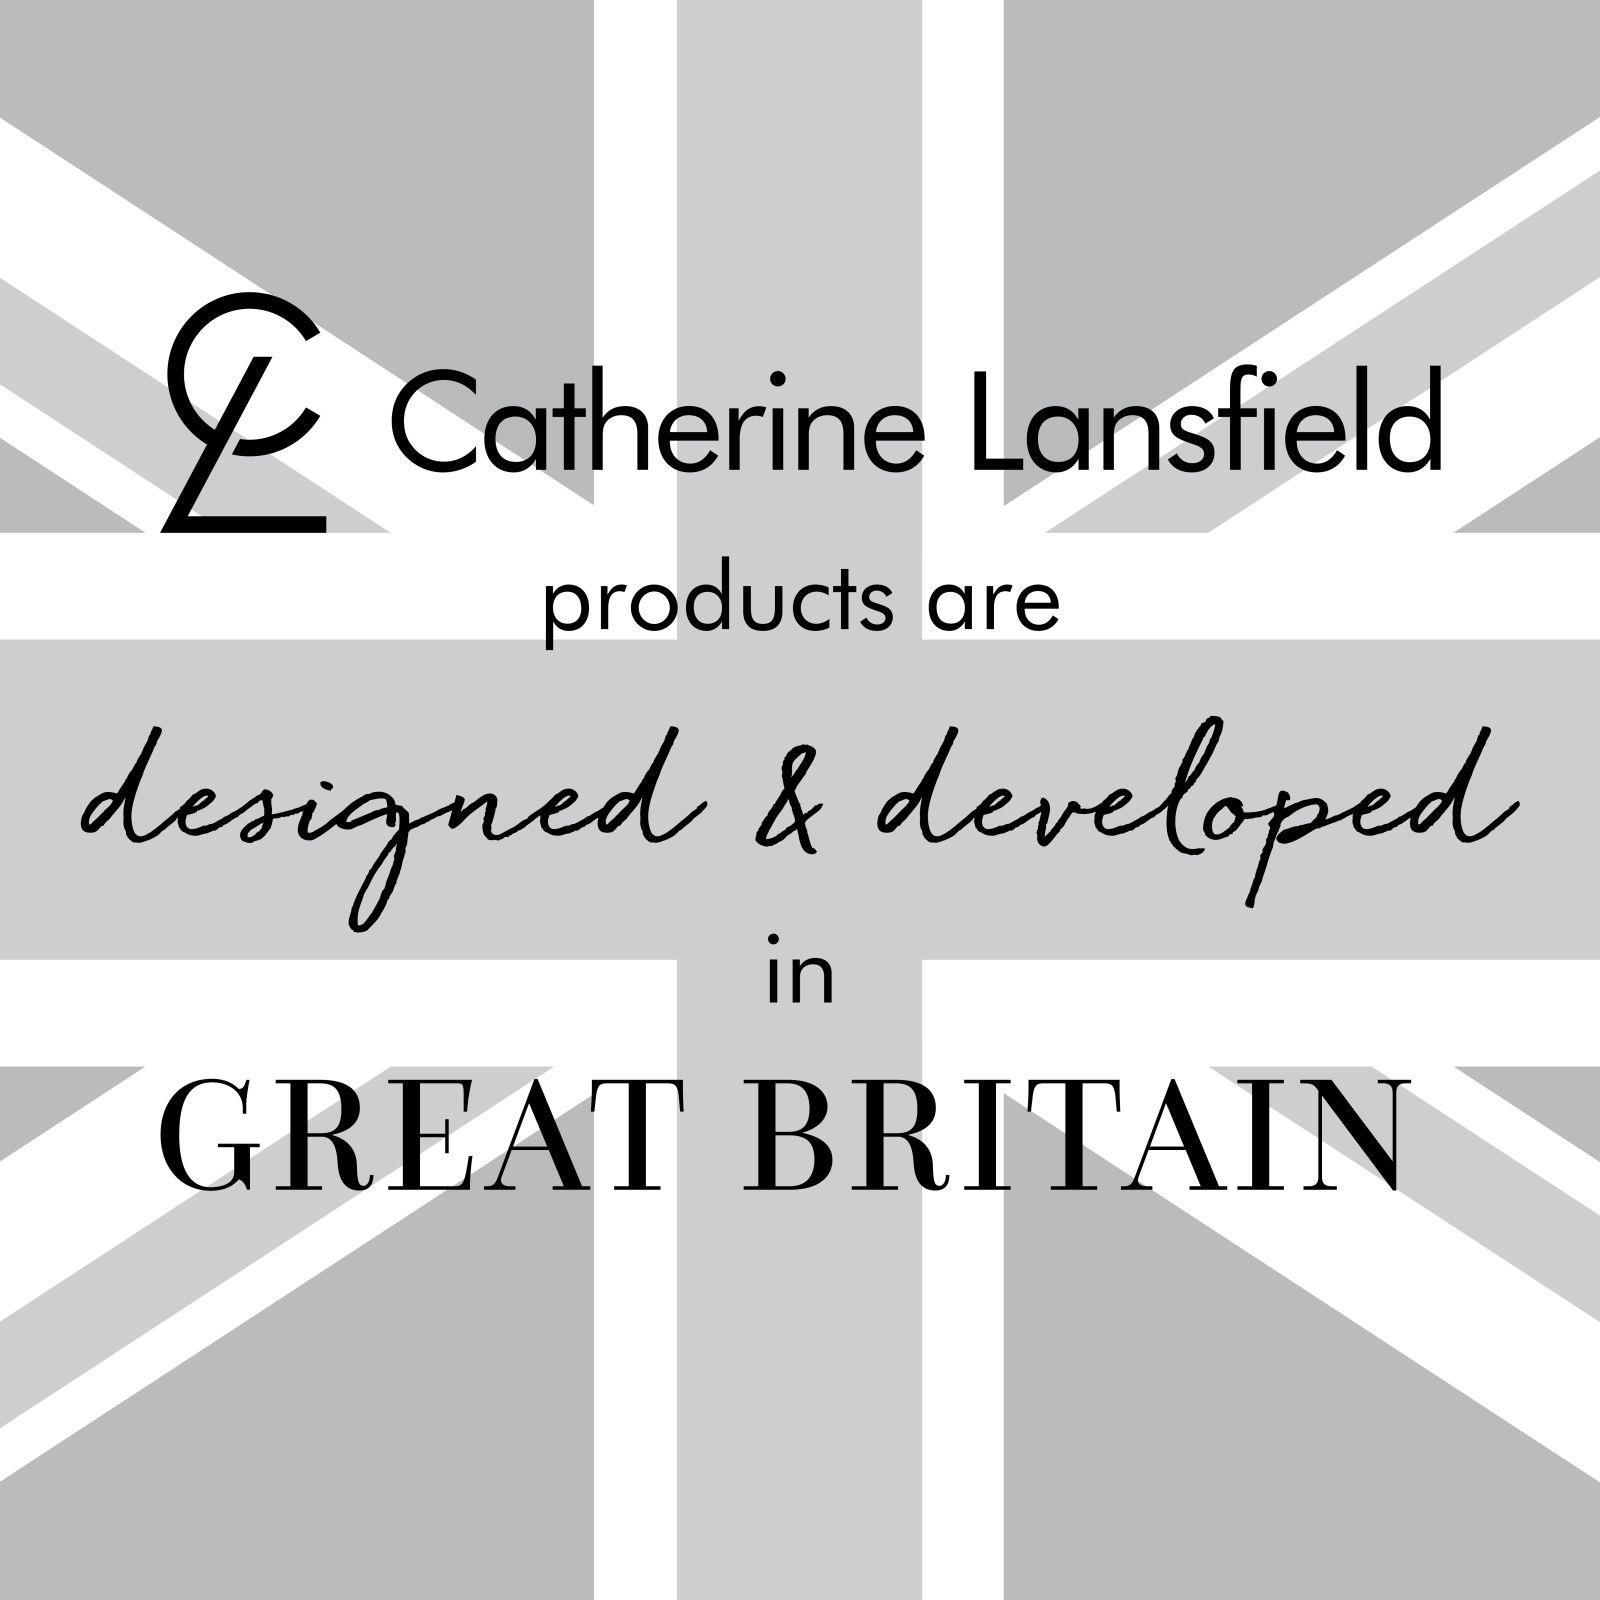 Catherine-Lansfield-Salisbury-Pink-cubierta-del-edredon-edredon-cubre-floral-de-conjuntos-de-cama miniatura 32